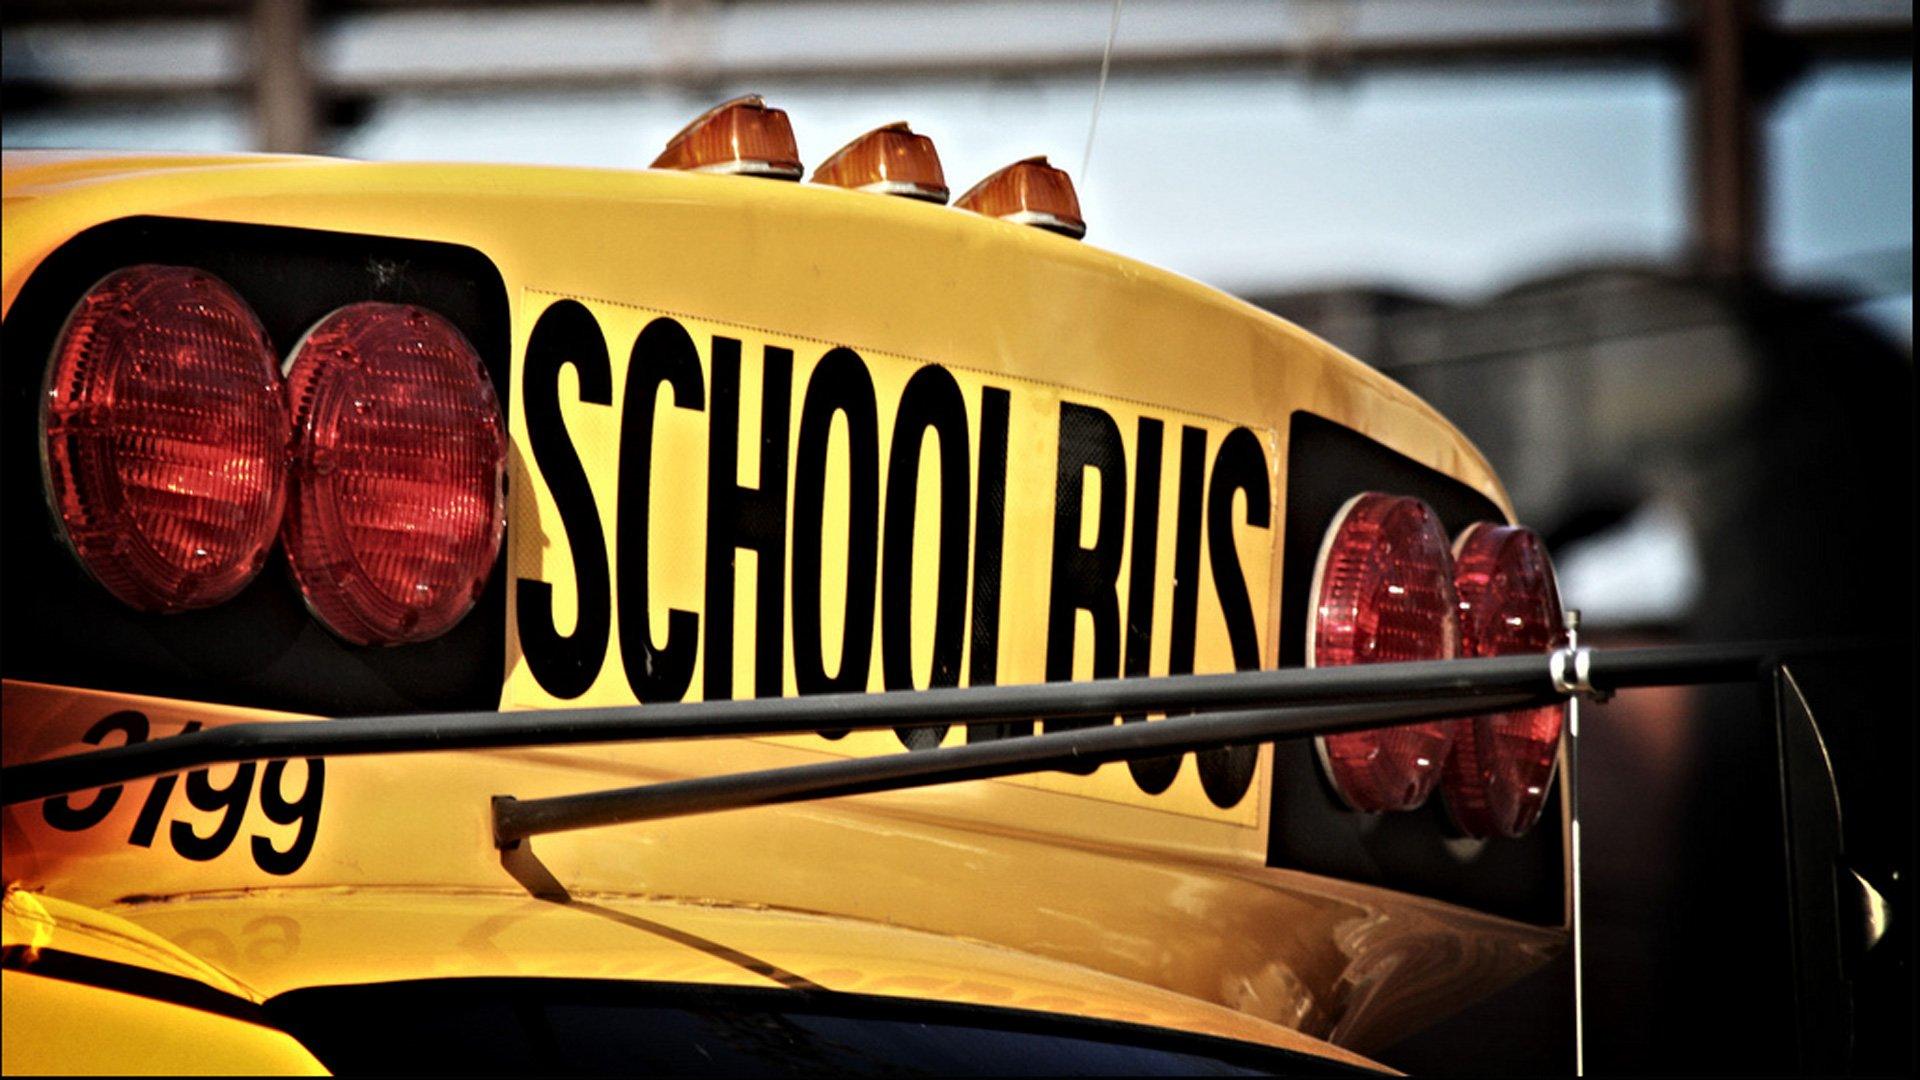 school bus wallpapers hd - photo #30